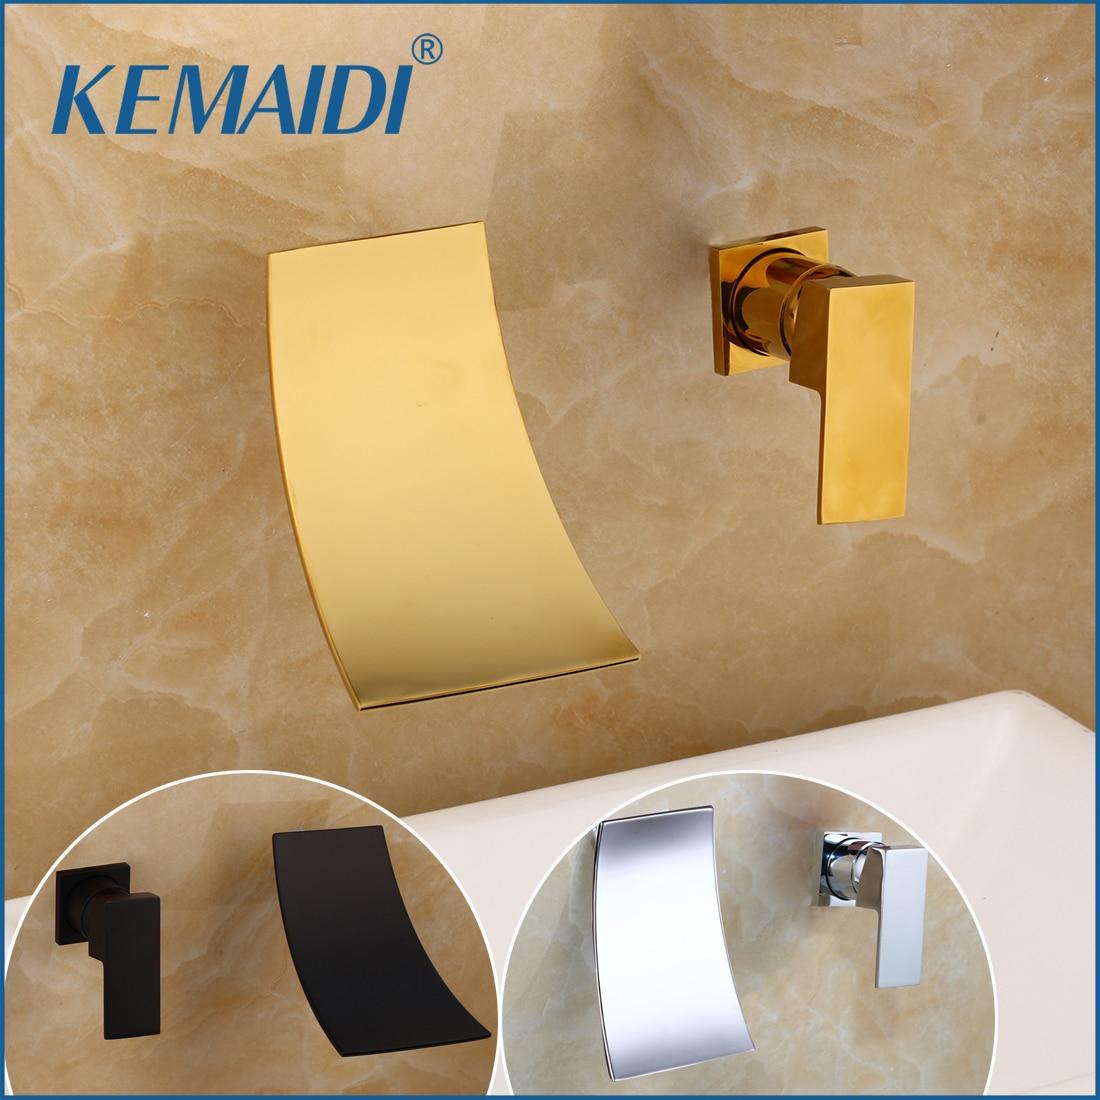 KEMAIDI Waterfall Spout Basin Faucet Single Lever Chrome/Gold Bathroom Washing Basin Tap Widespread Lavatory Sink Mixer Crane